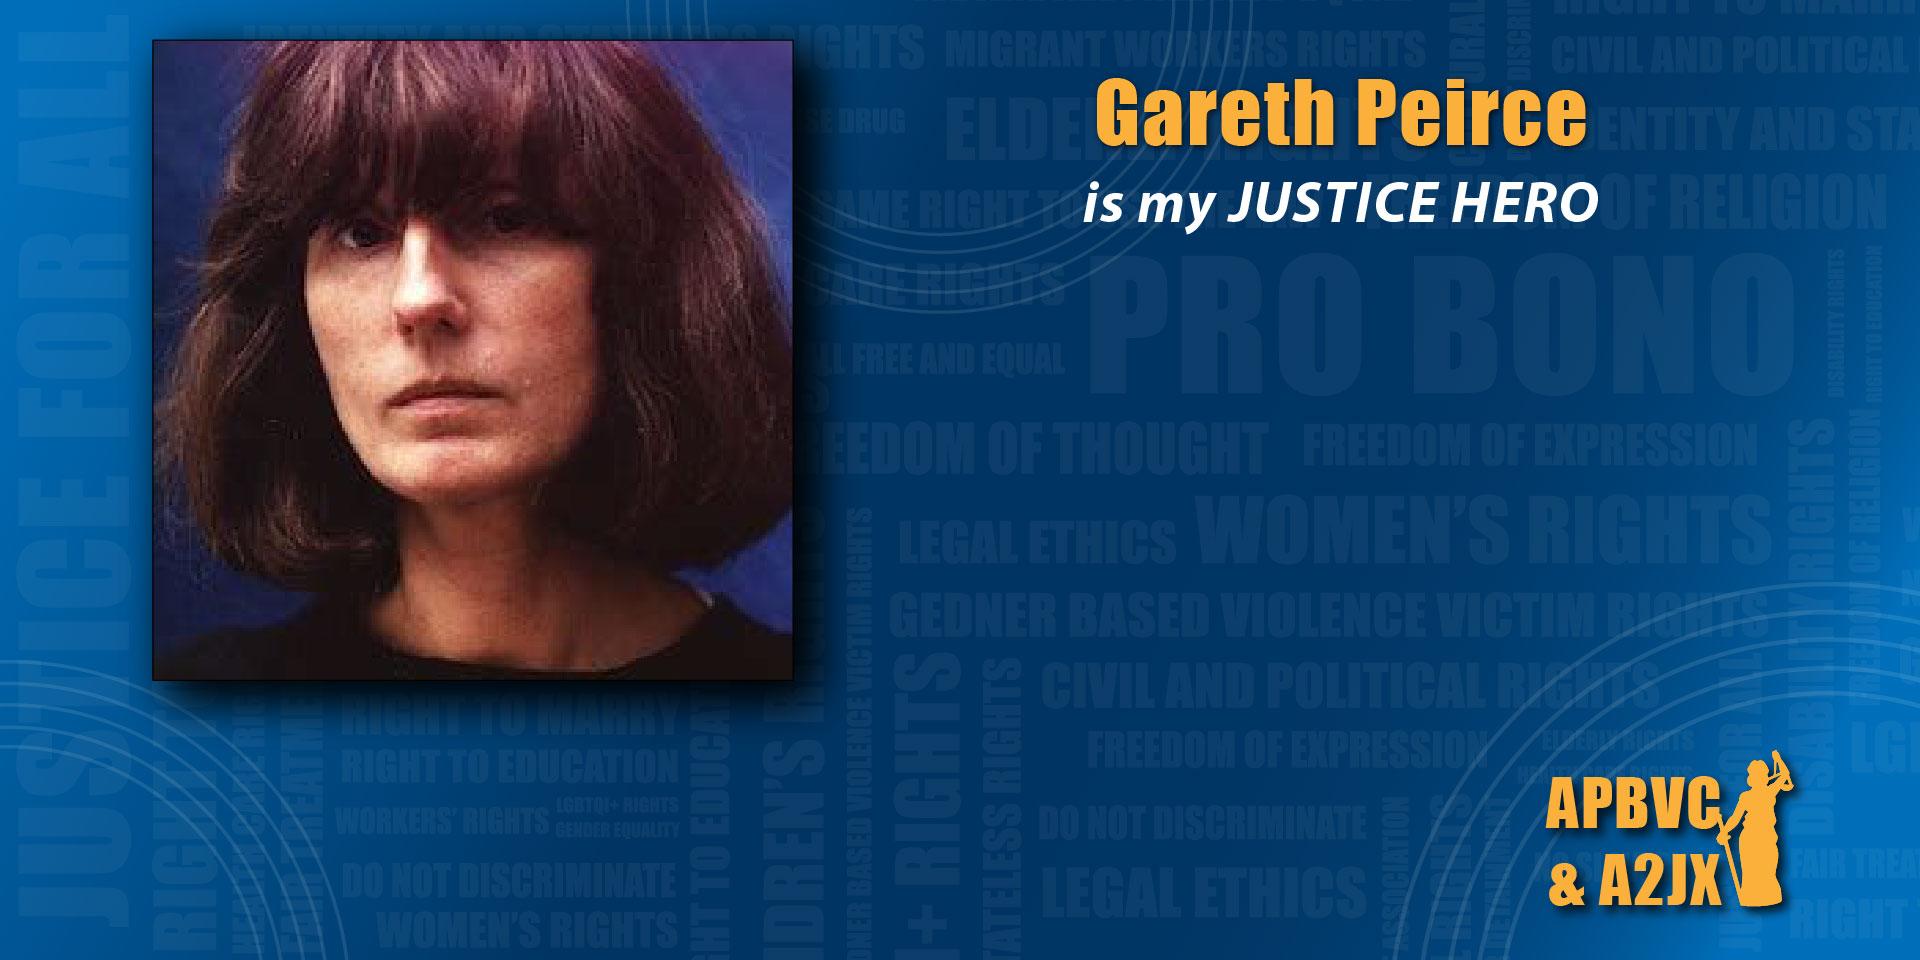 Gareth Peirce